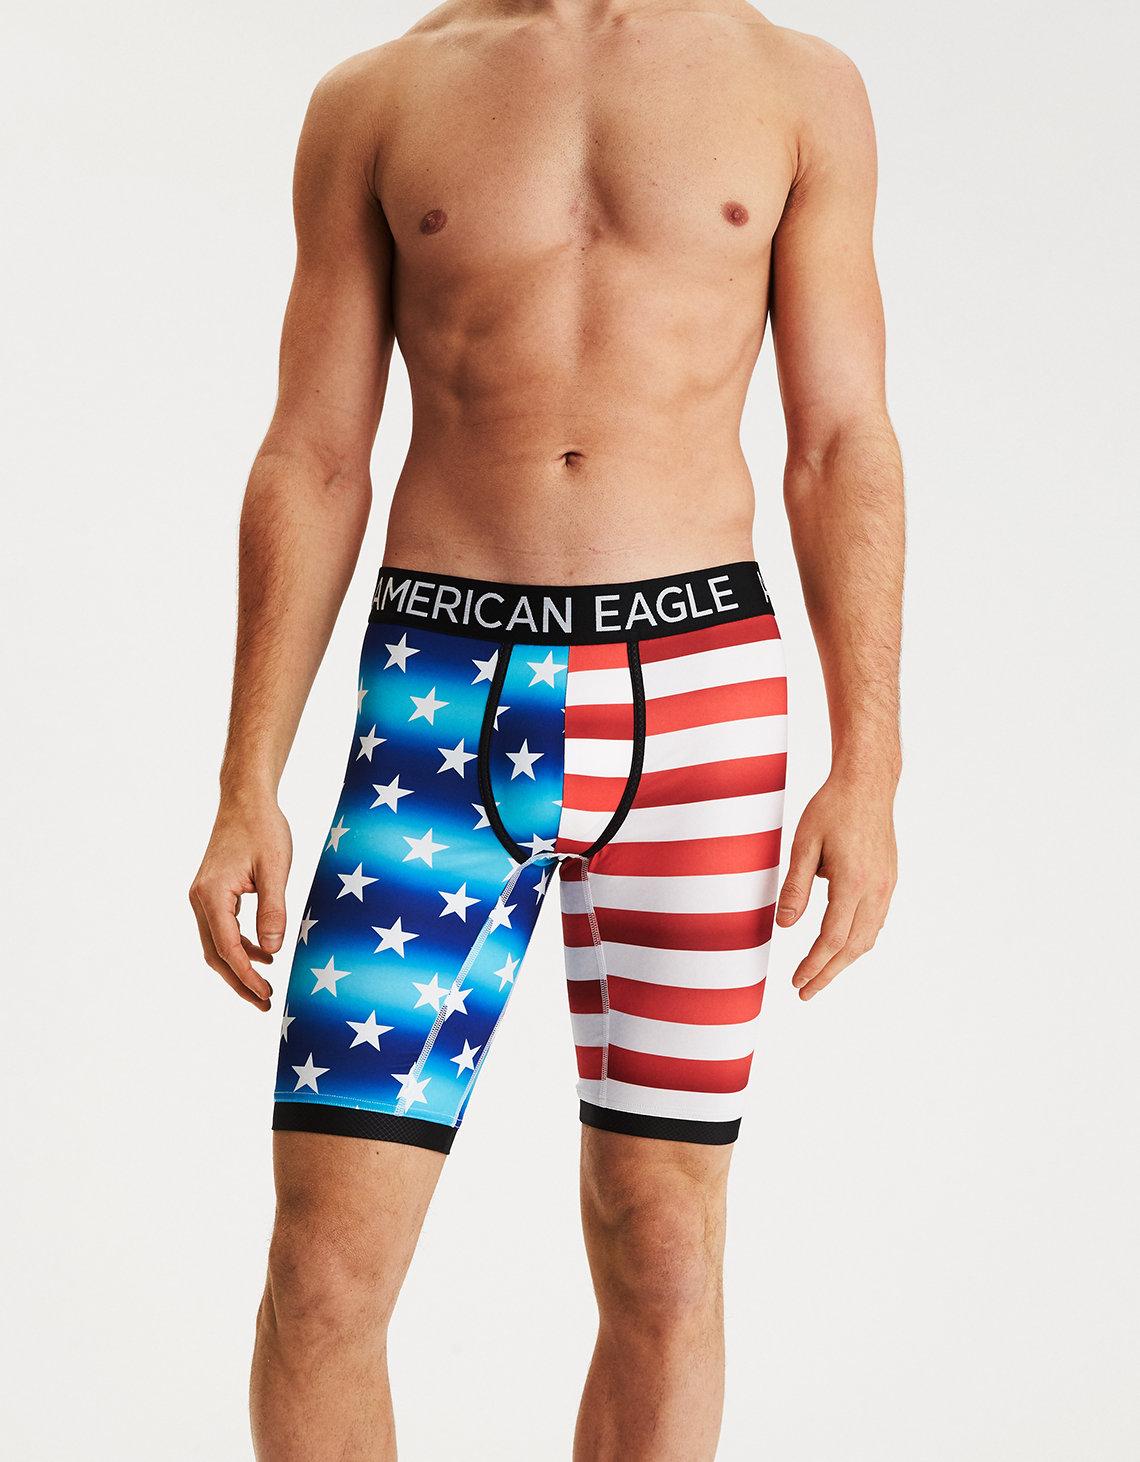 Well-Endowed Underwear Review: American Eagle AEO Mesh